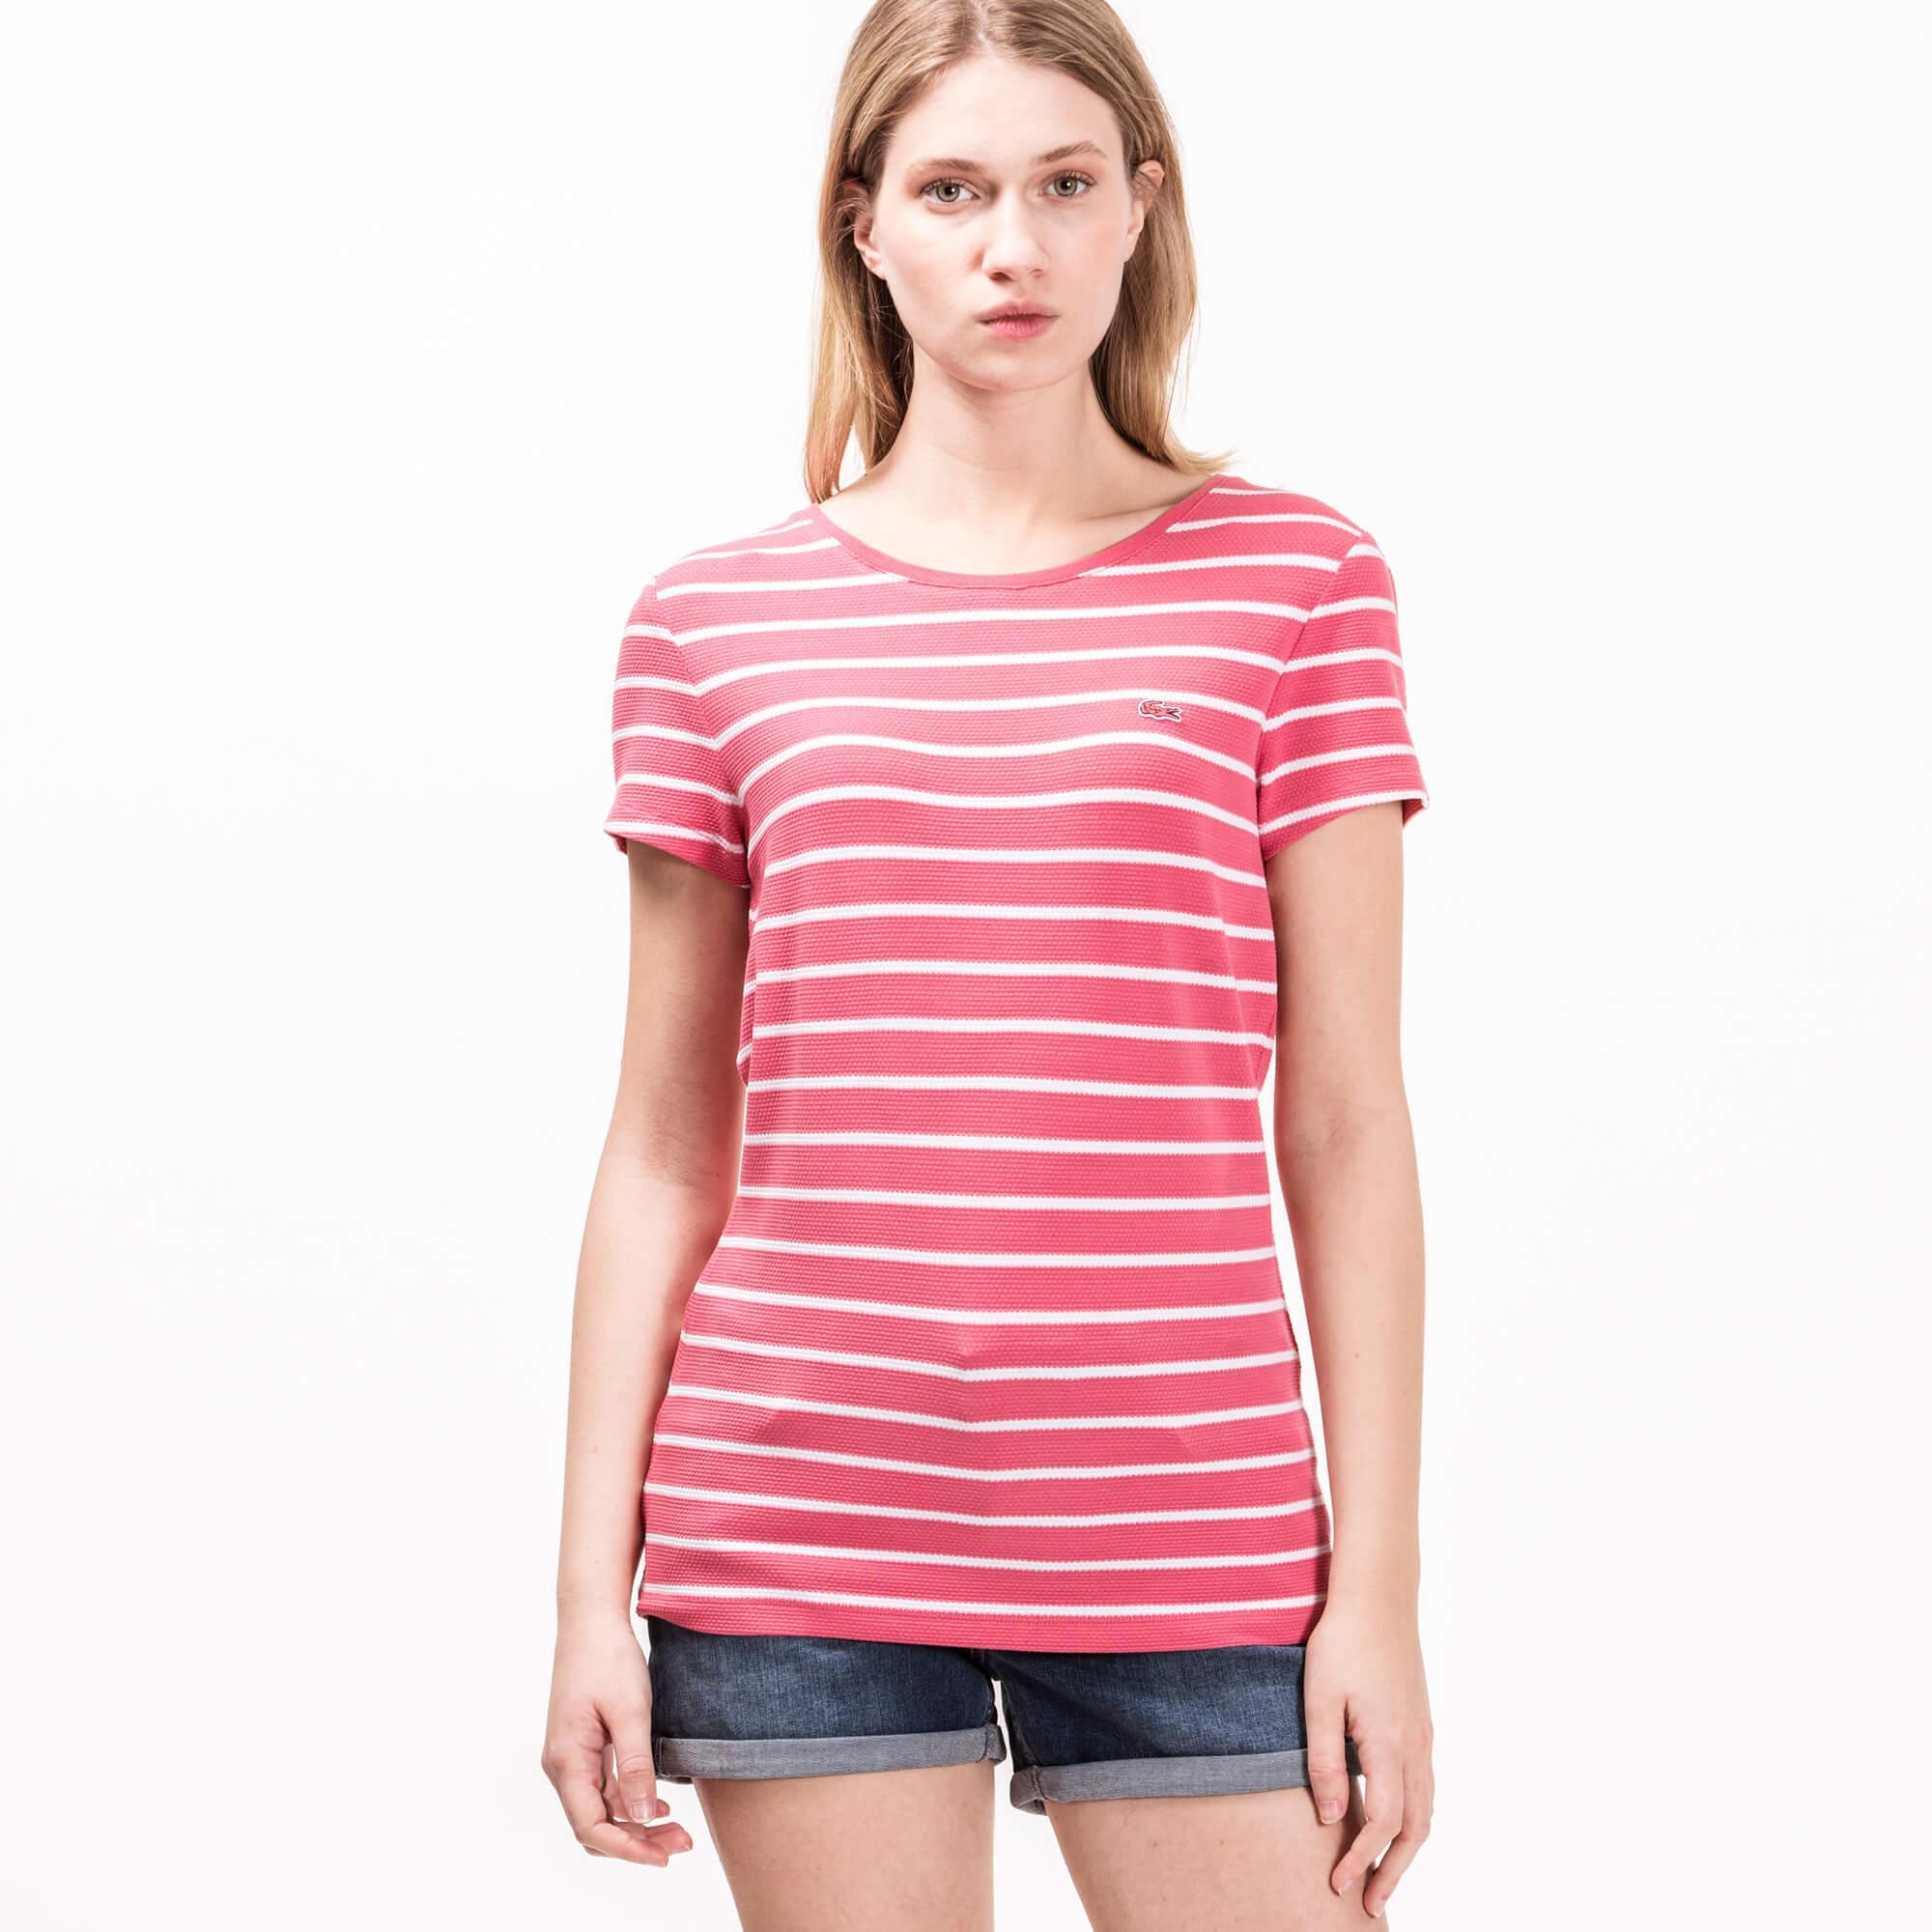 Lacoste Kadın Pembe Çizgili T-Shirt